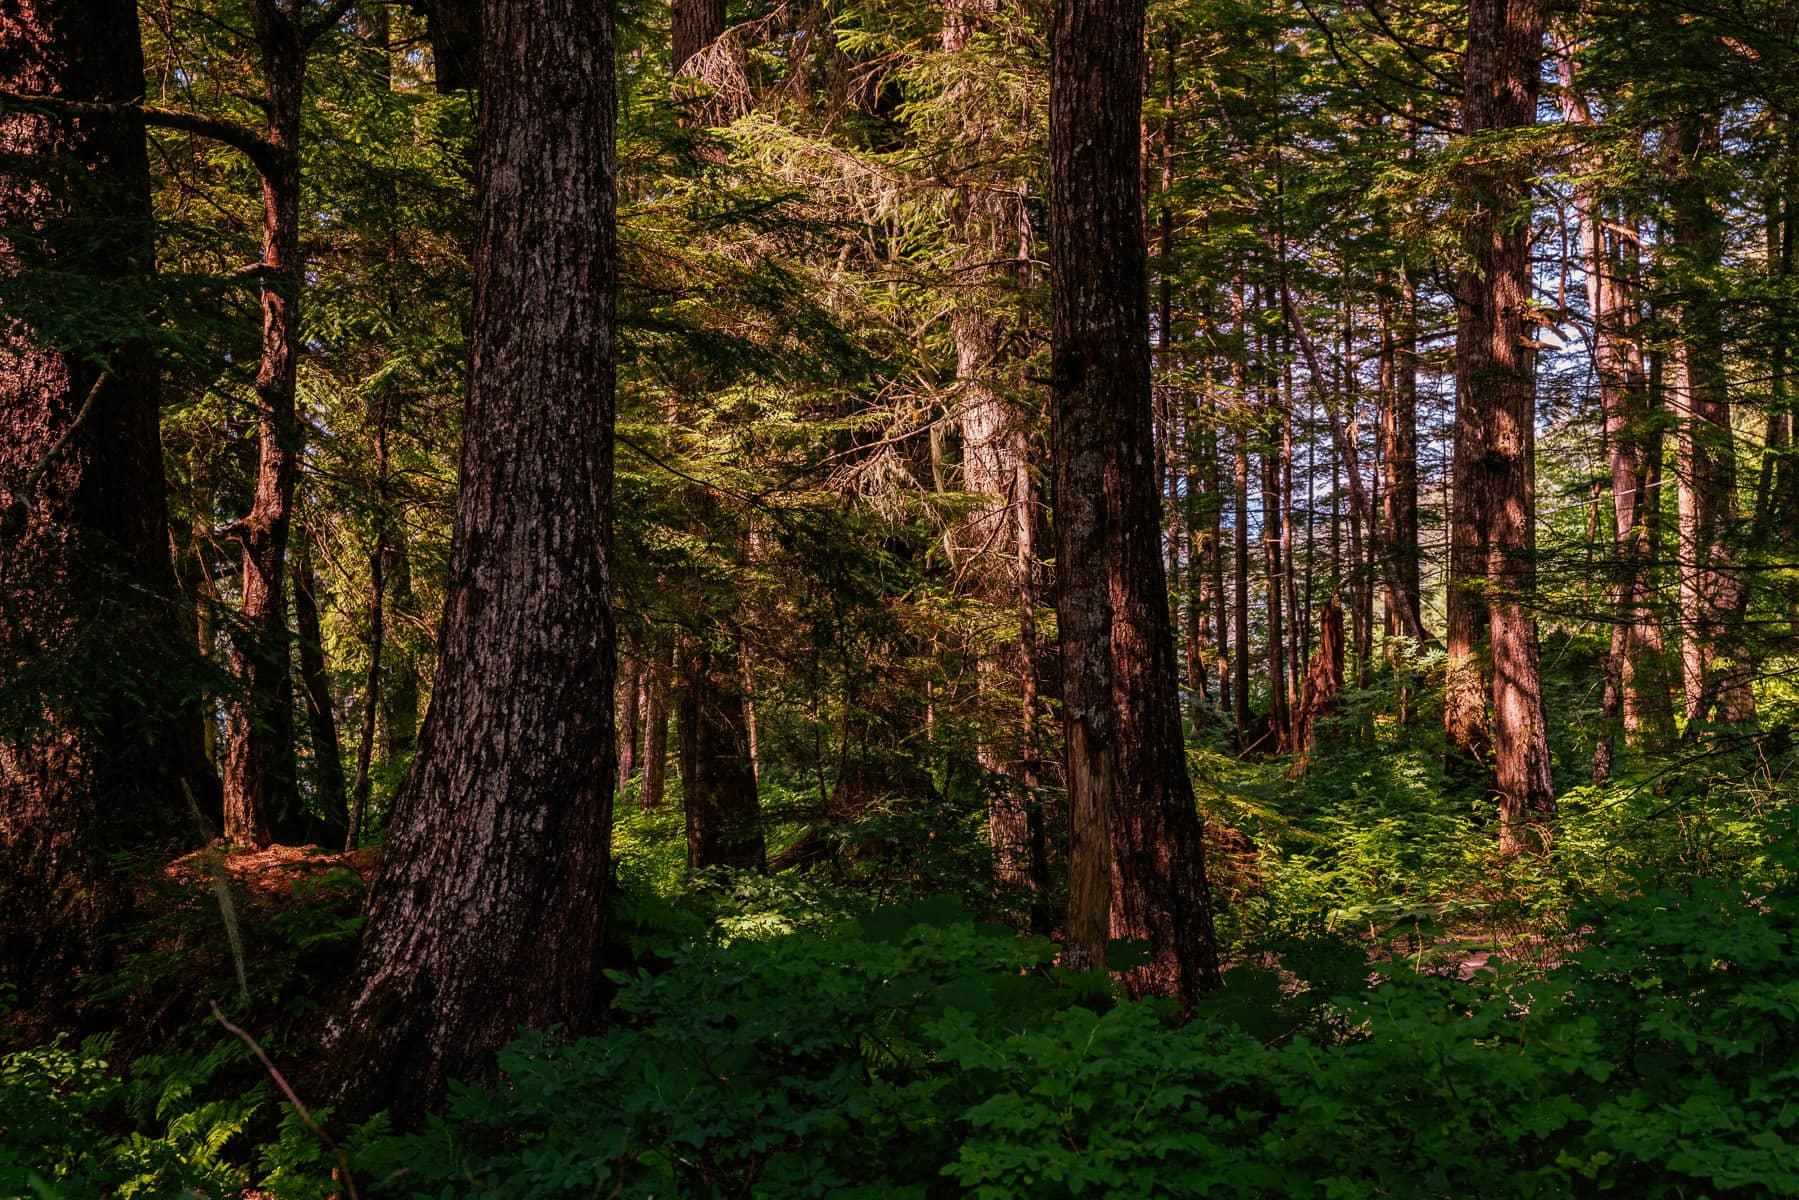 Old trees grow in a forest near Juneau, Alaska.